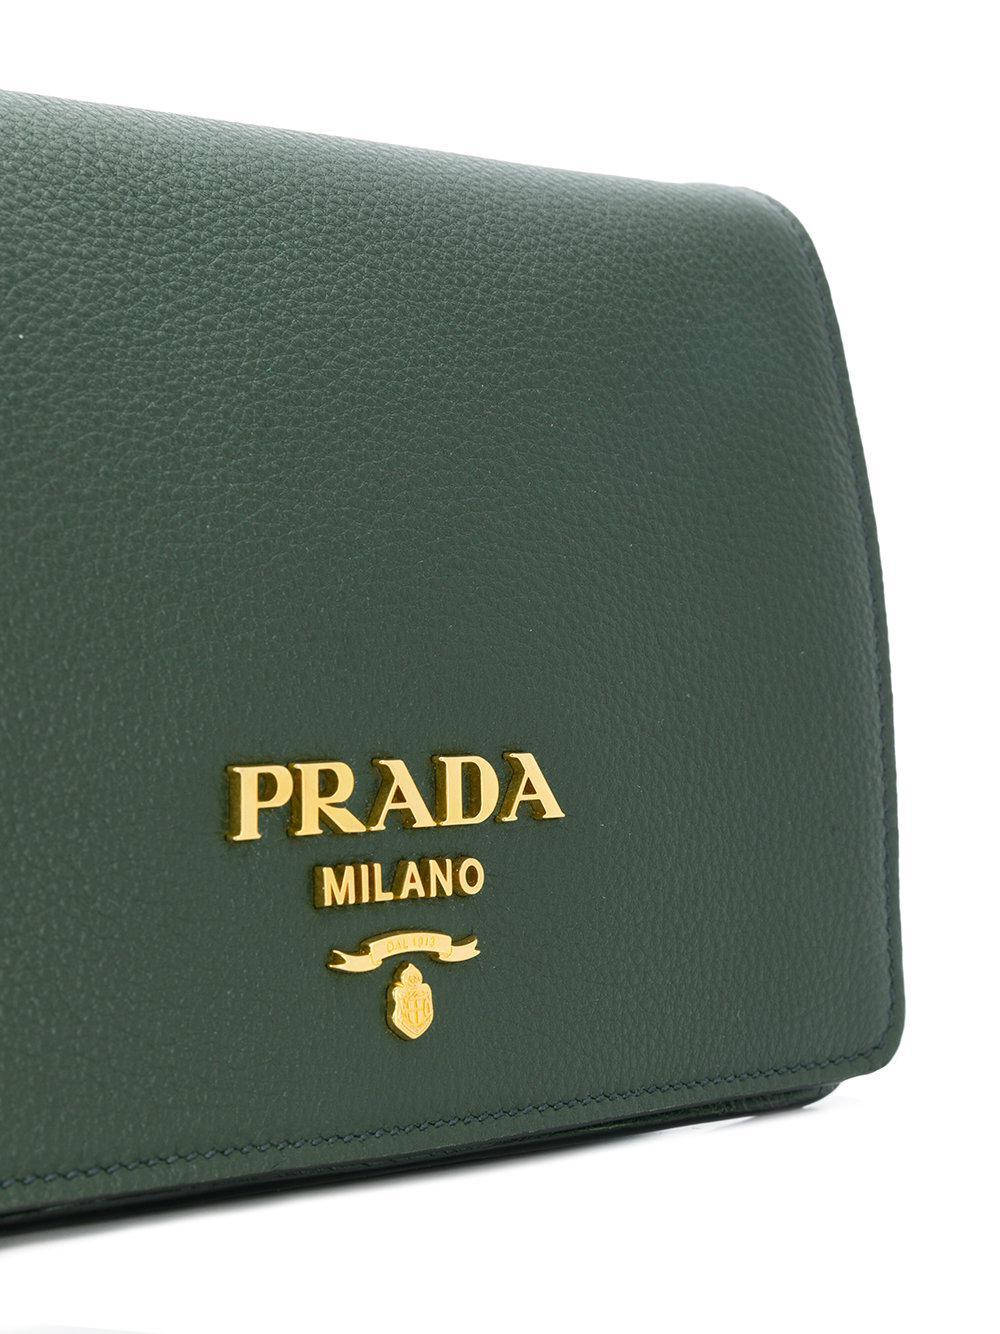 Prada Leather Pebbled Crossbody in Green